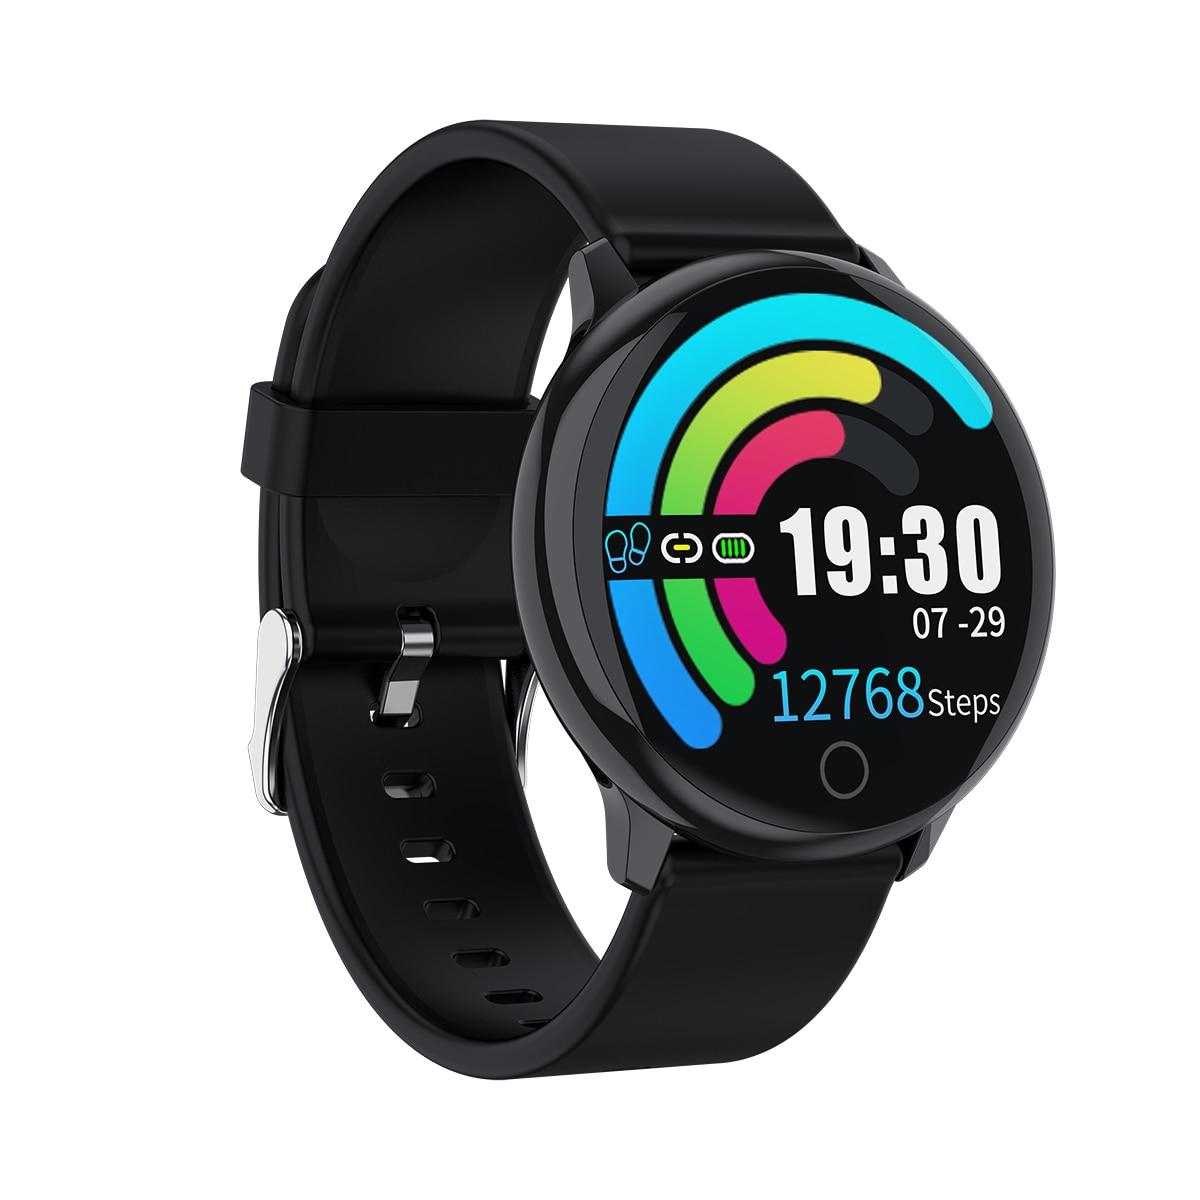 Newwear Q16 Smart Watch Men Full Touch Screen Silicone Steel Belt Black Wristband Waterproof Heart Rate Monitor Sport Smart Band